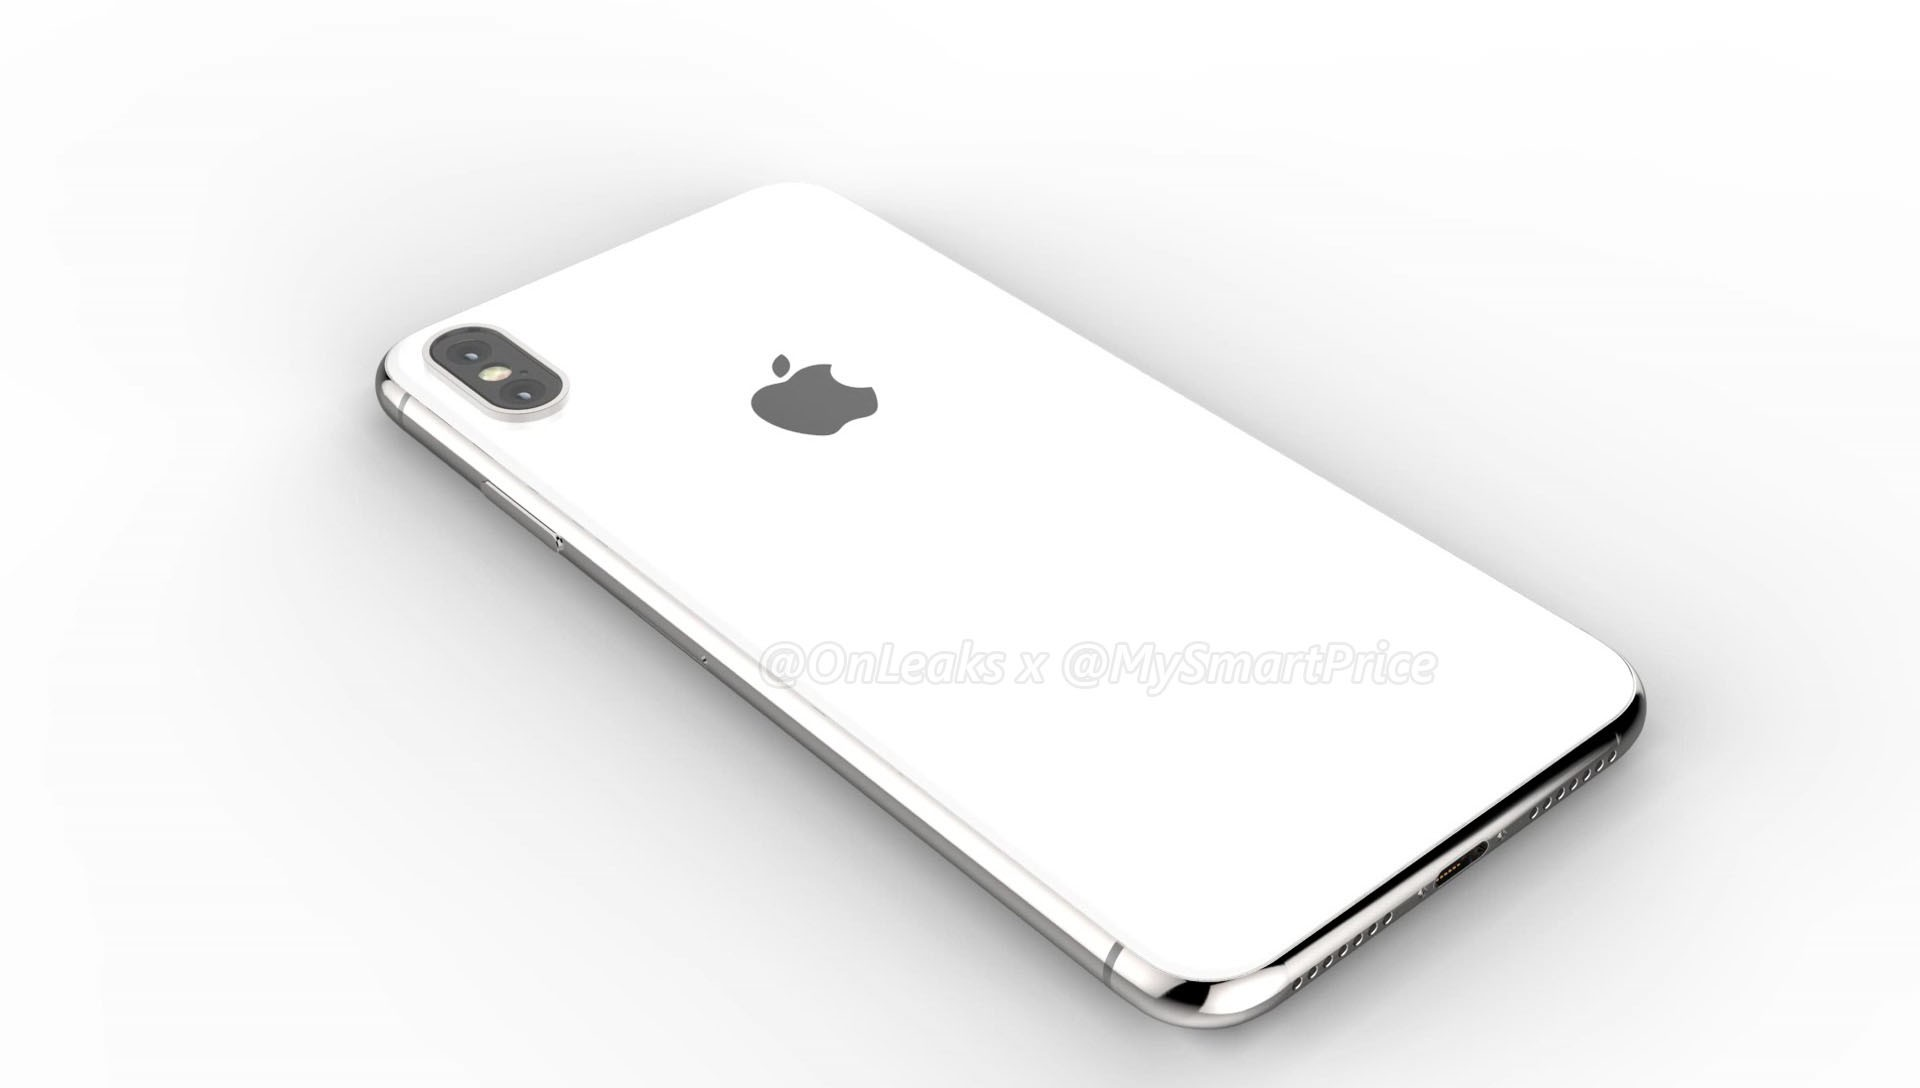 apple s iphone x plus leaked 521376 8 - اپل ، تصاویر آیفون ایکس پلاس لو رفت